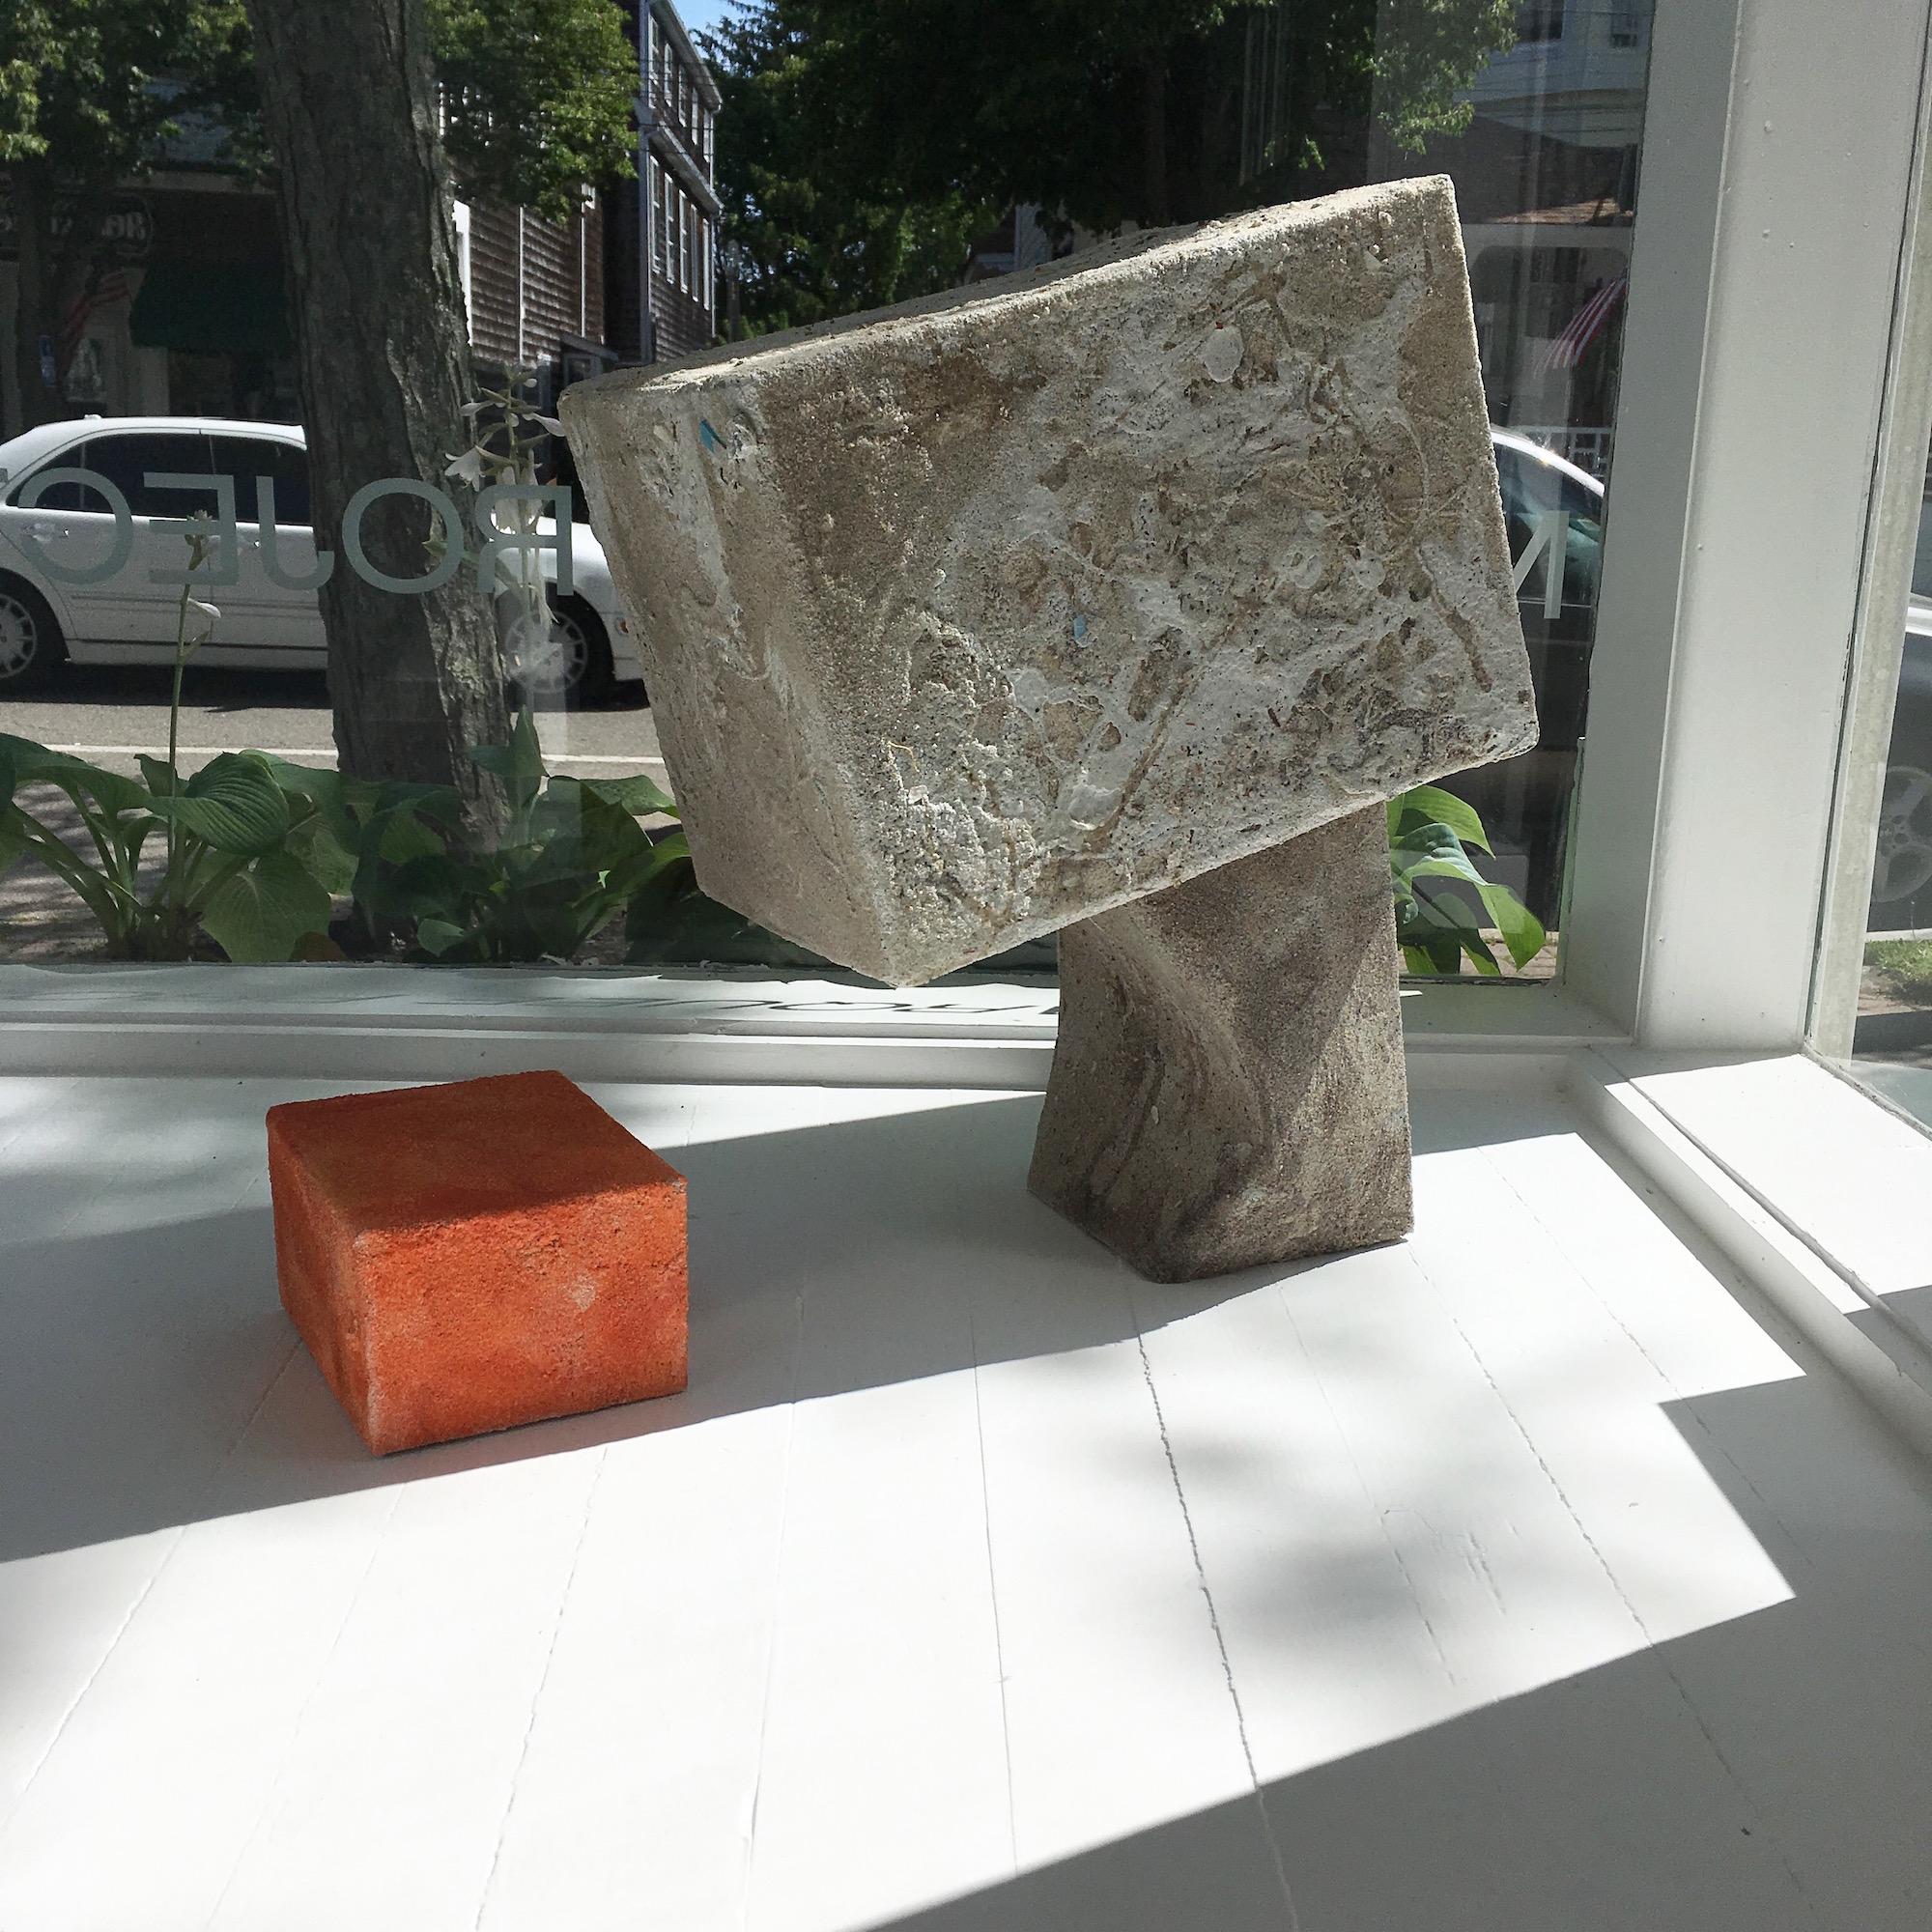 "Mark Van Wagner, ""Sandbox (code)"", 2017. Sand on cardboard, 16 x 24 x 12 inches (variable)"